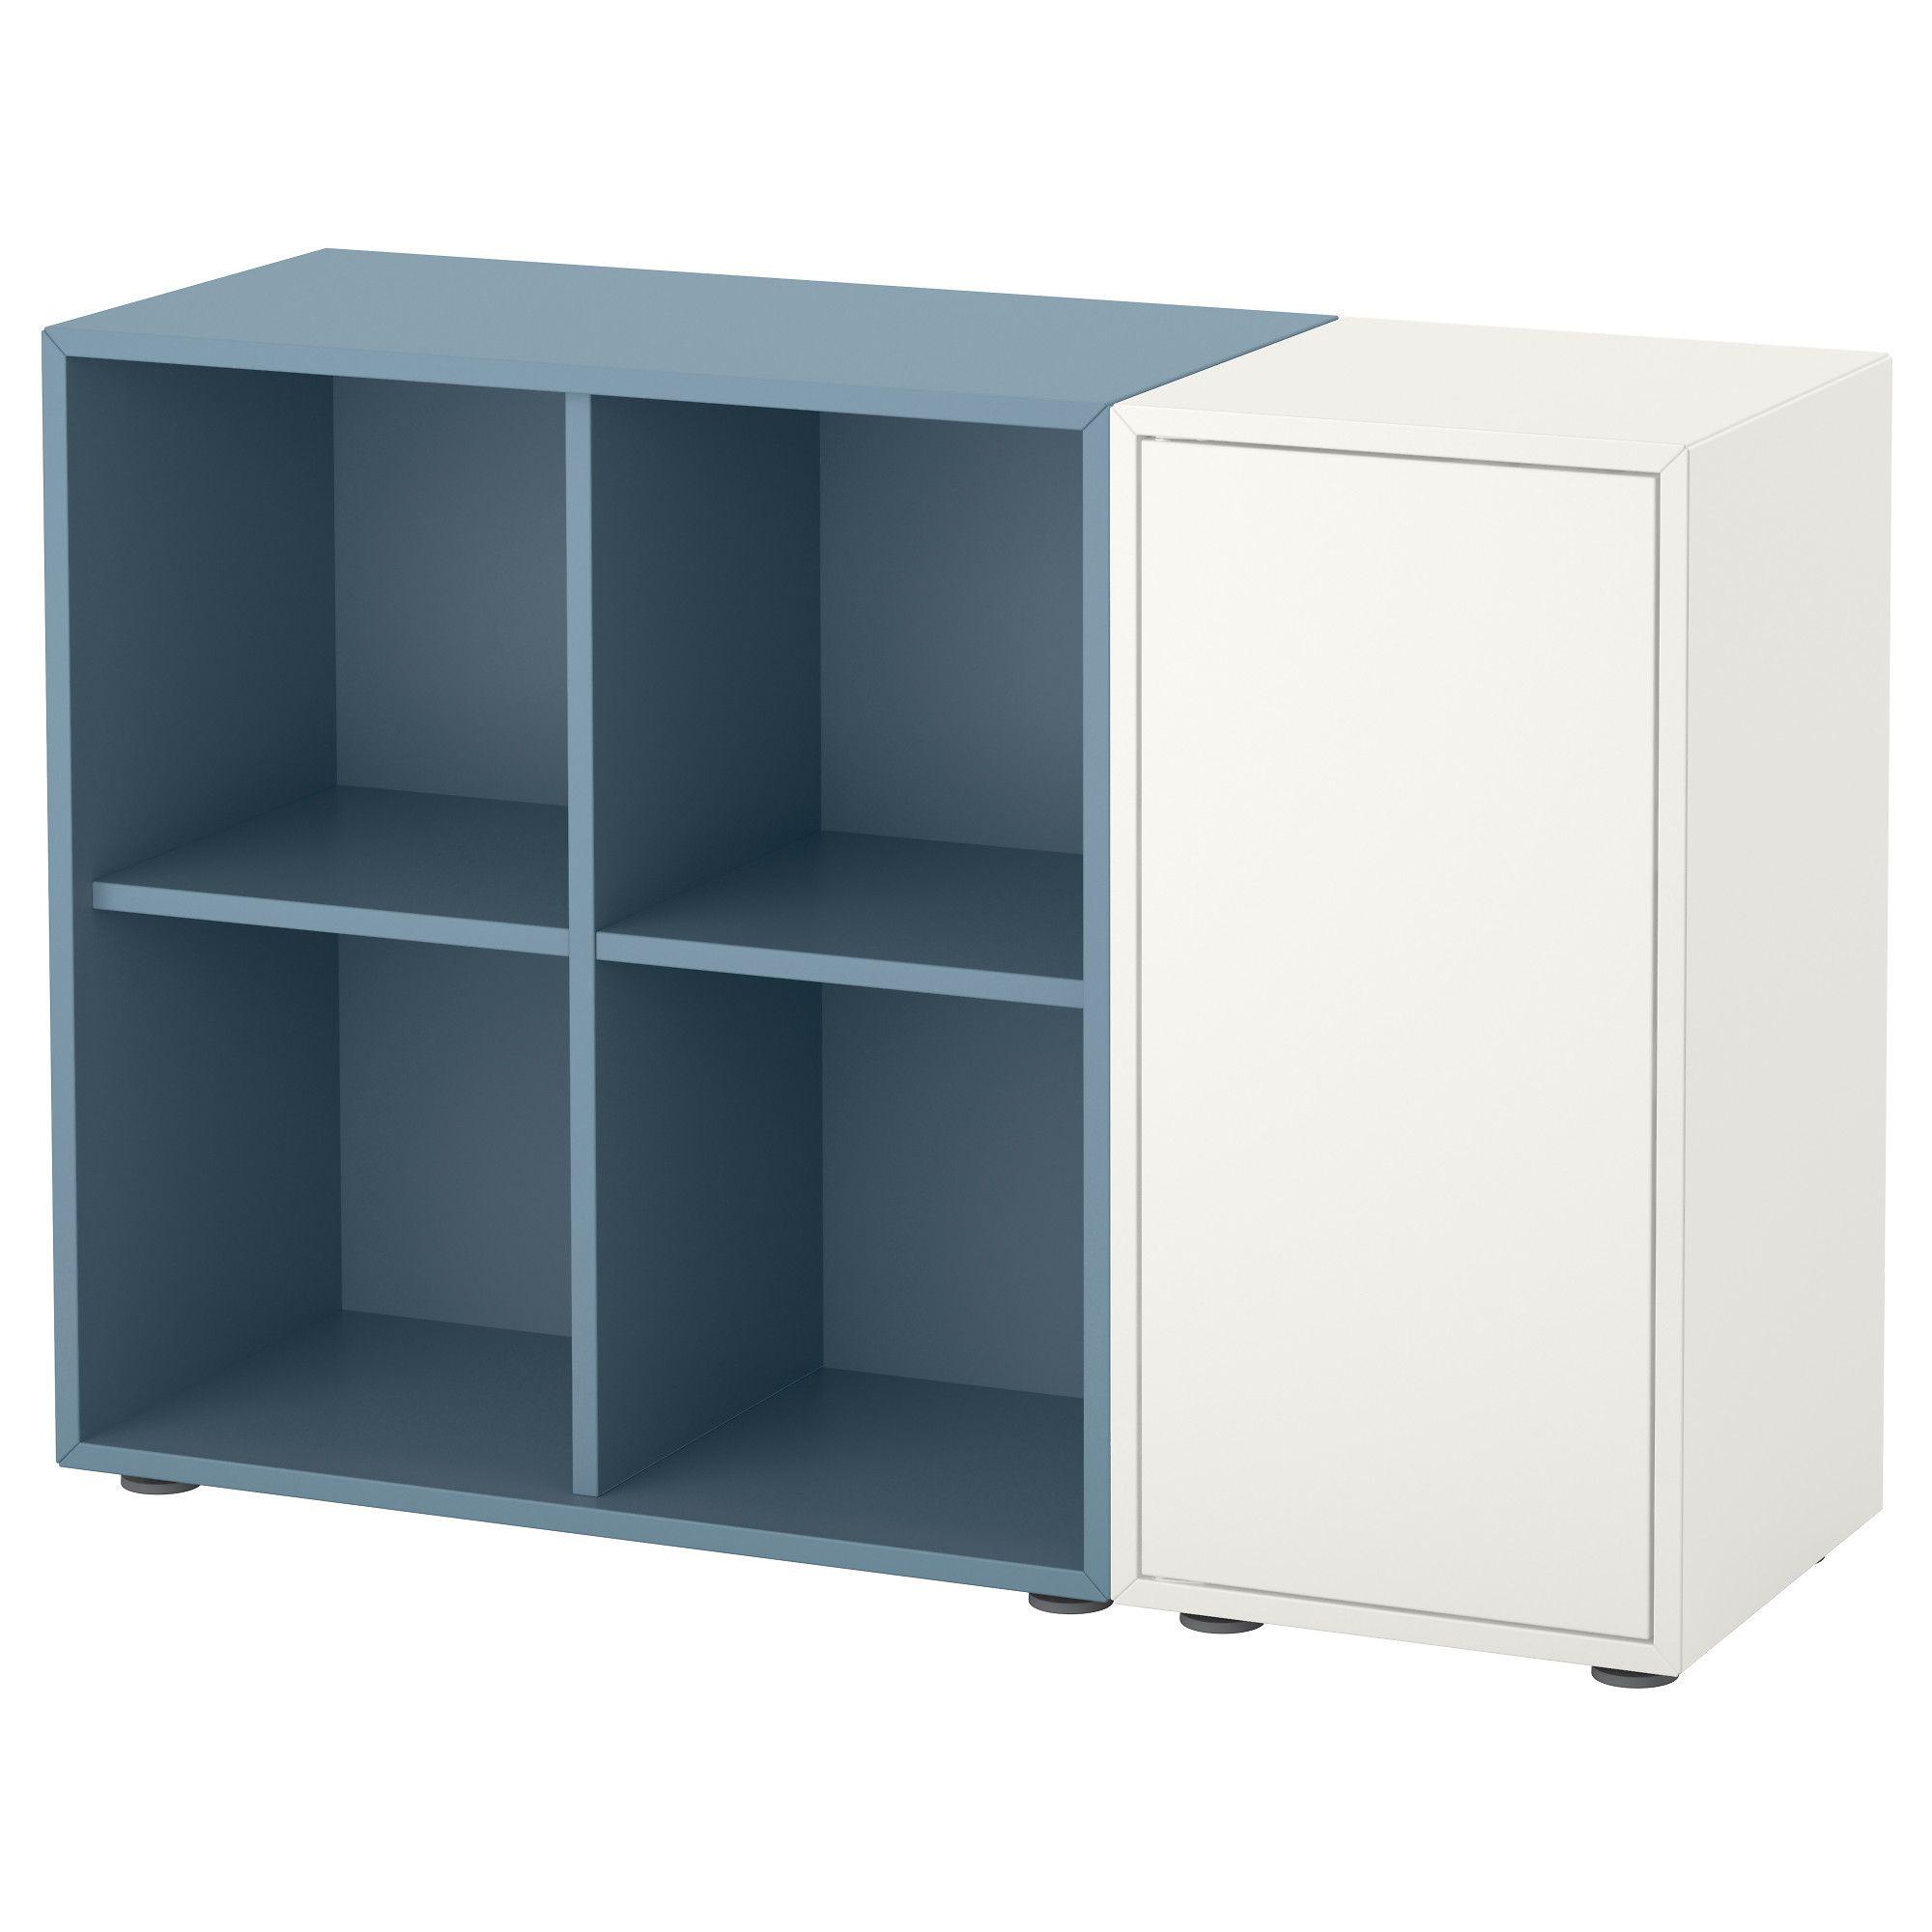 Eket Storage Combination With Feet, White, Light Blue